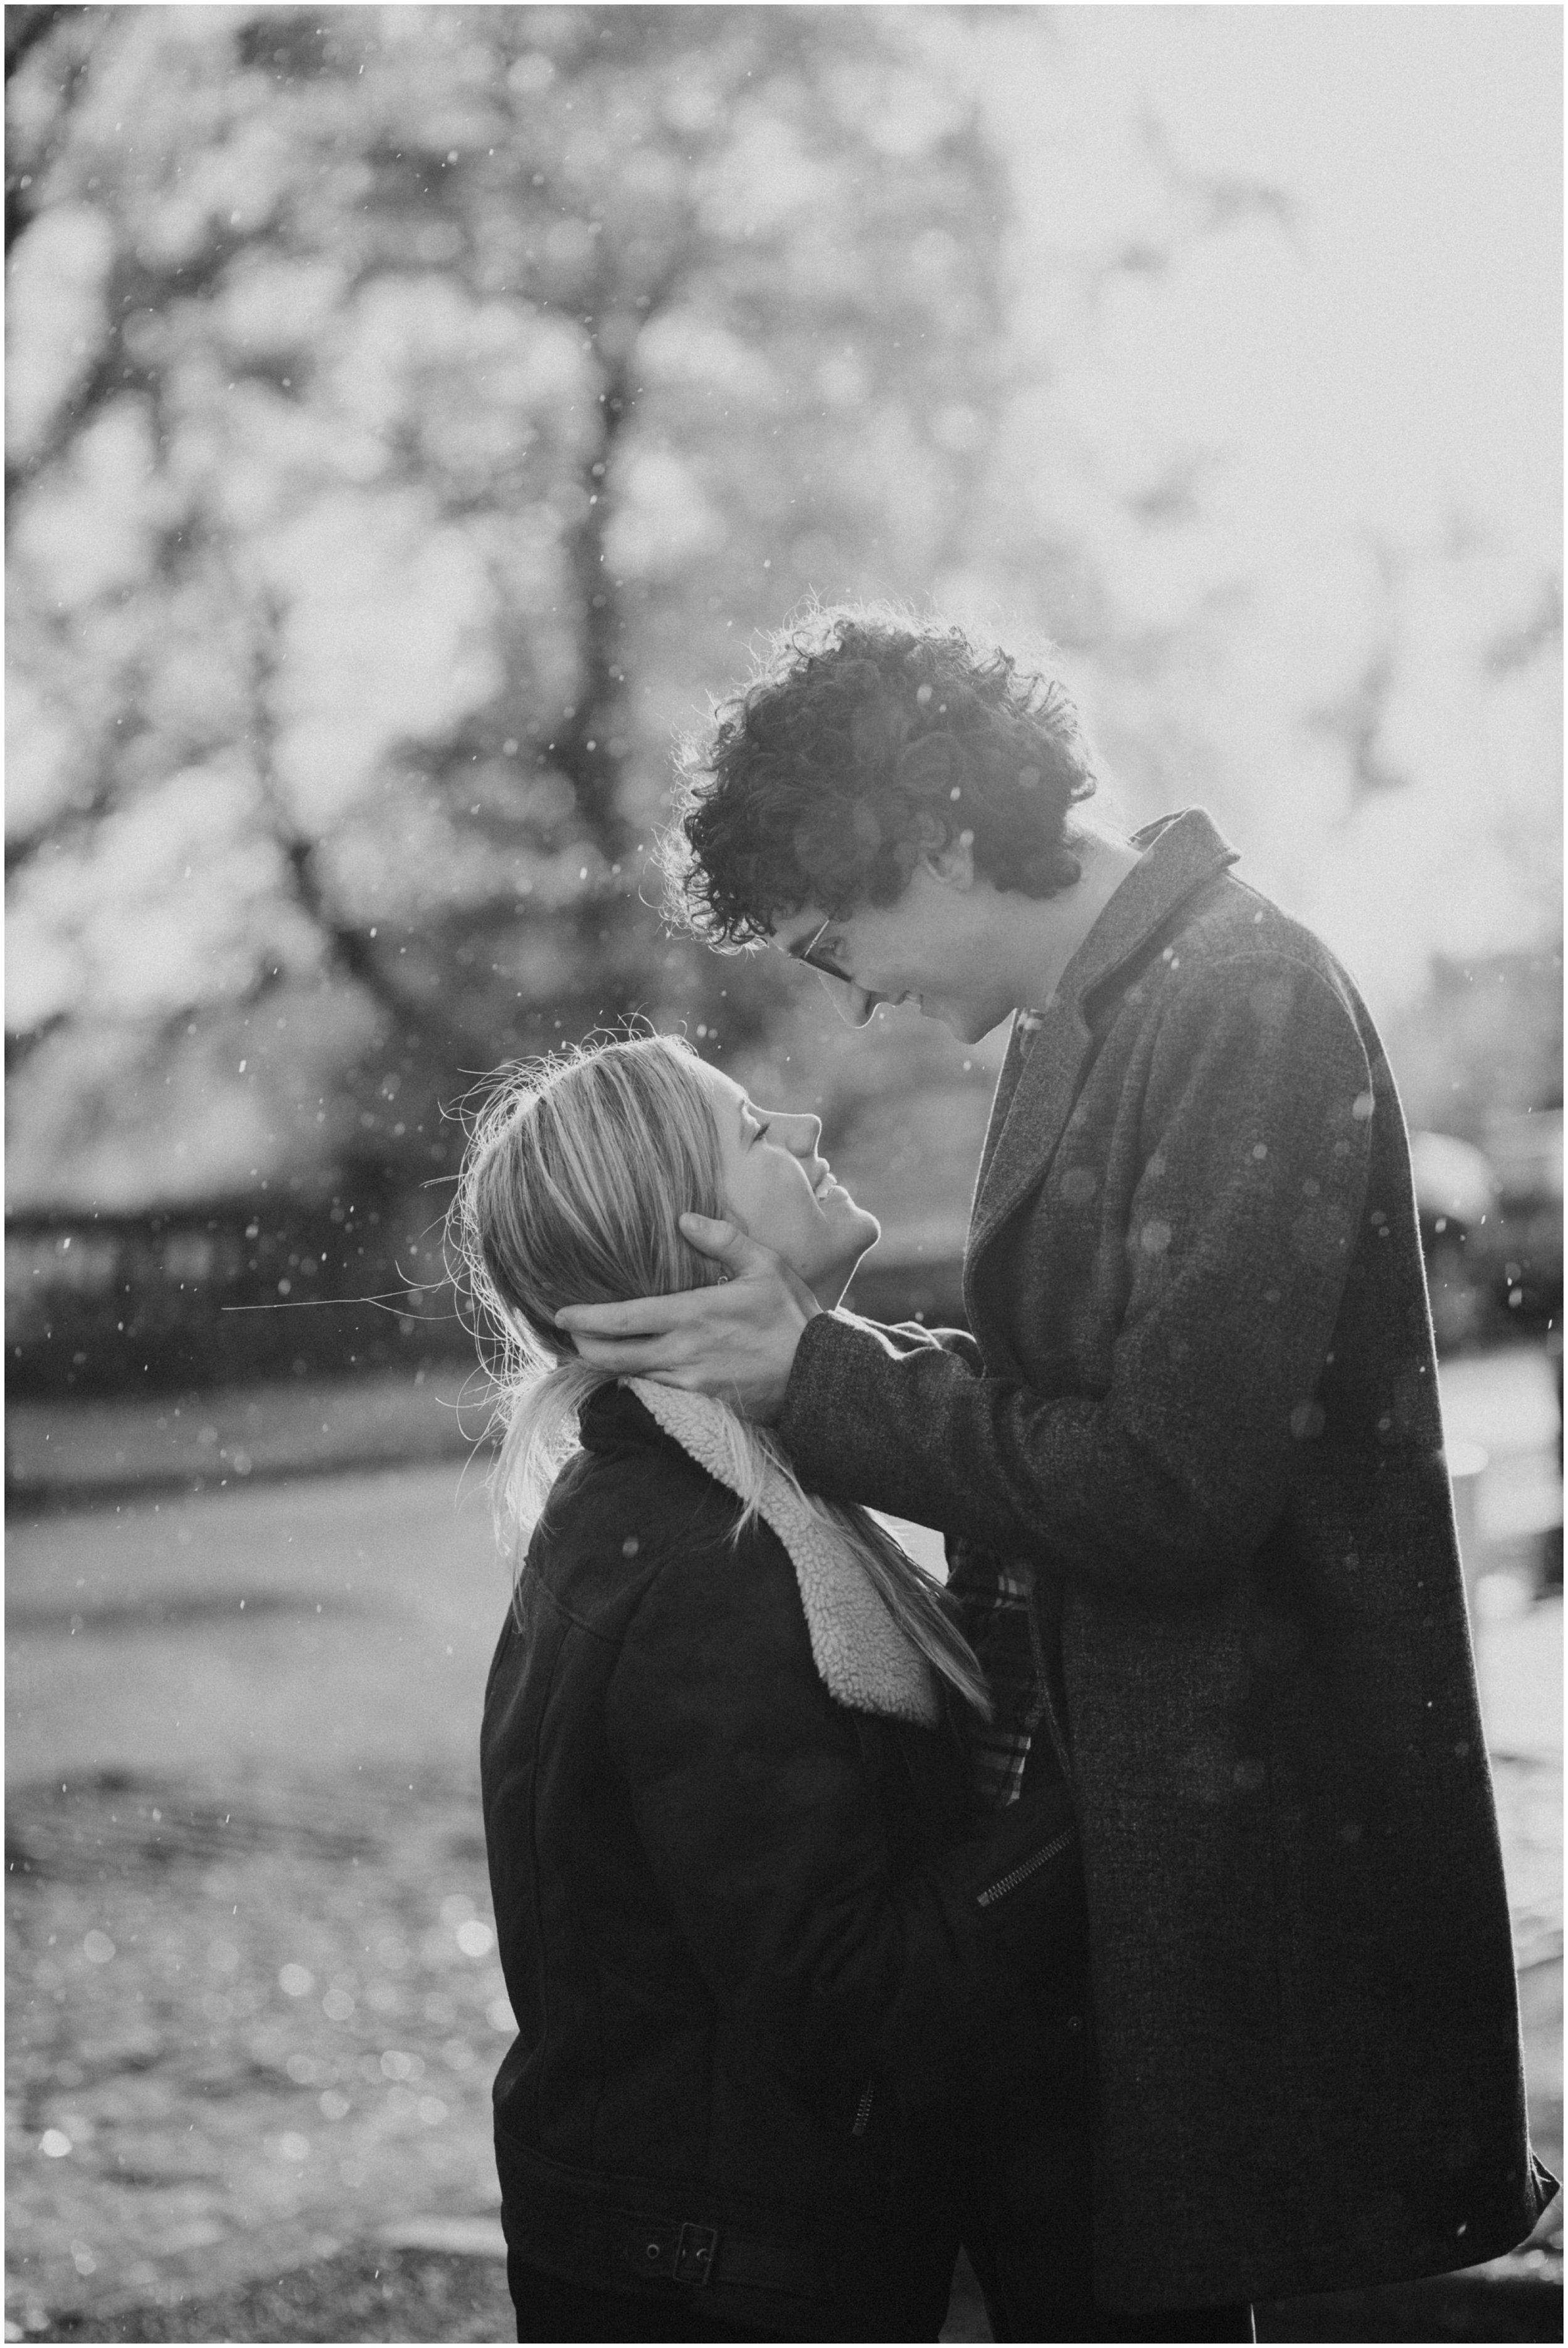 Photography 78 - Glasgow Wedding Photographer - April & Fraser - Park Circus Engagement_0008.jpg